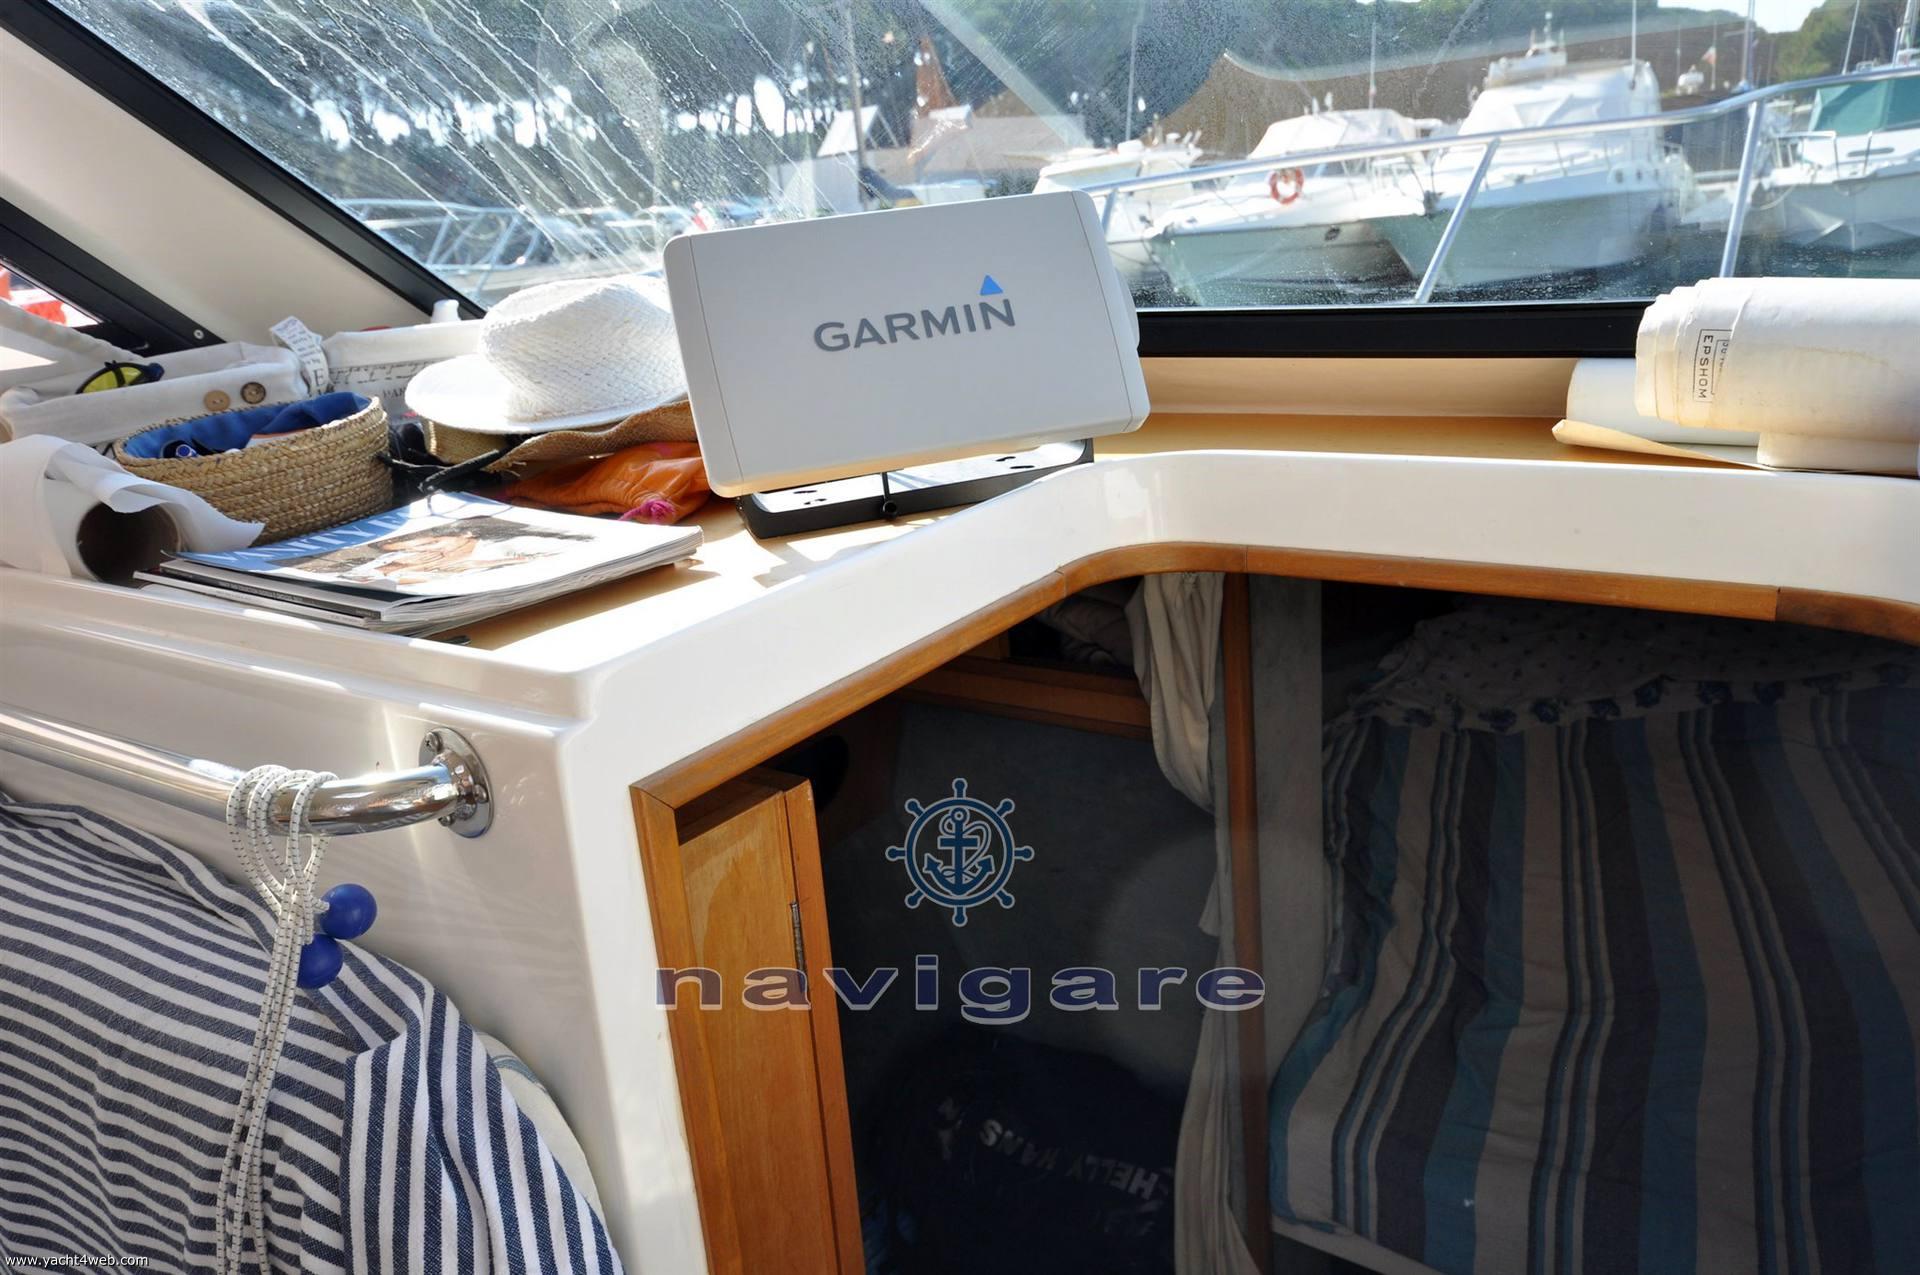 Plastik Space 310 cruiser Motor yacht used